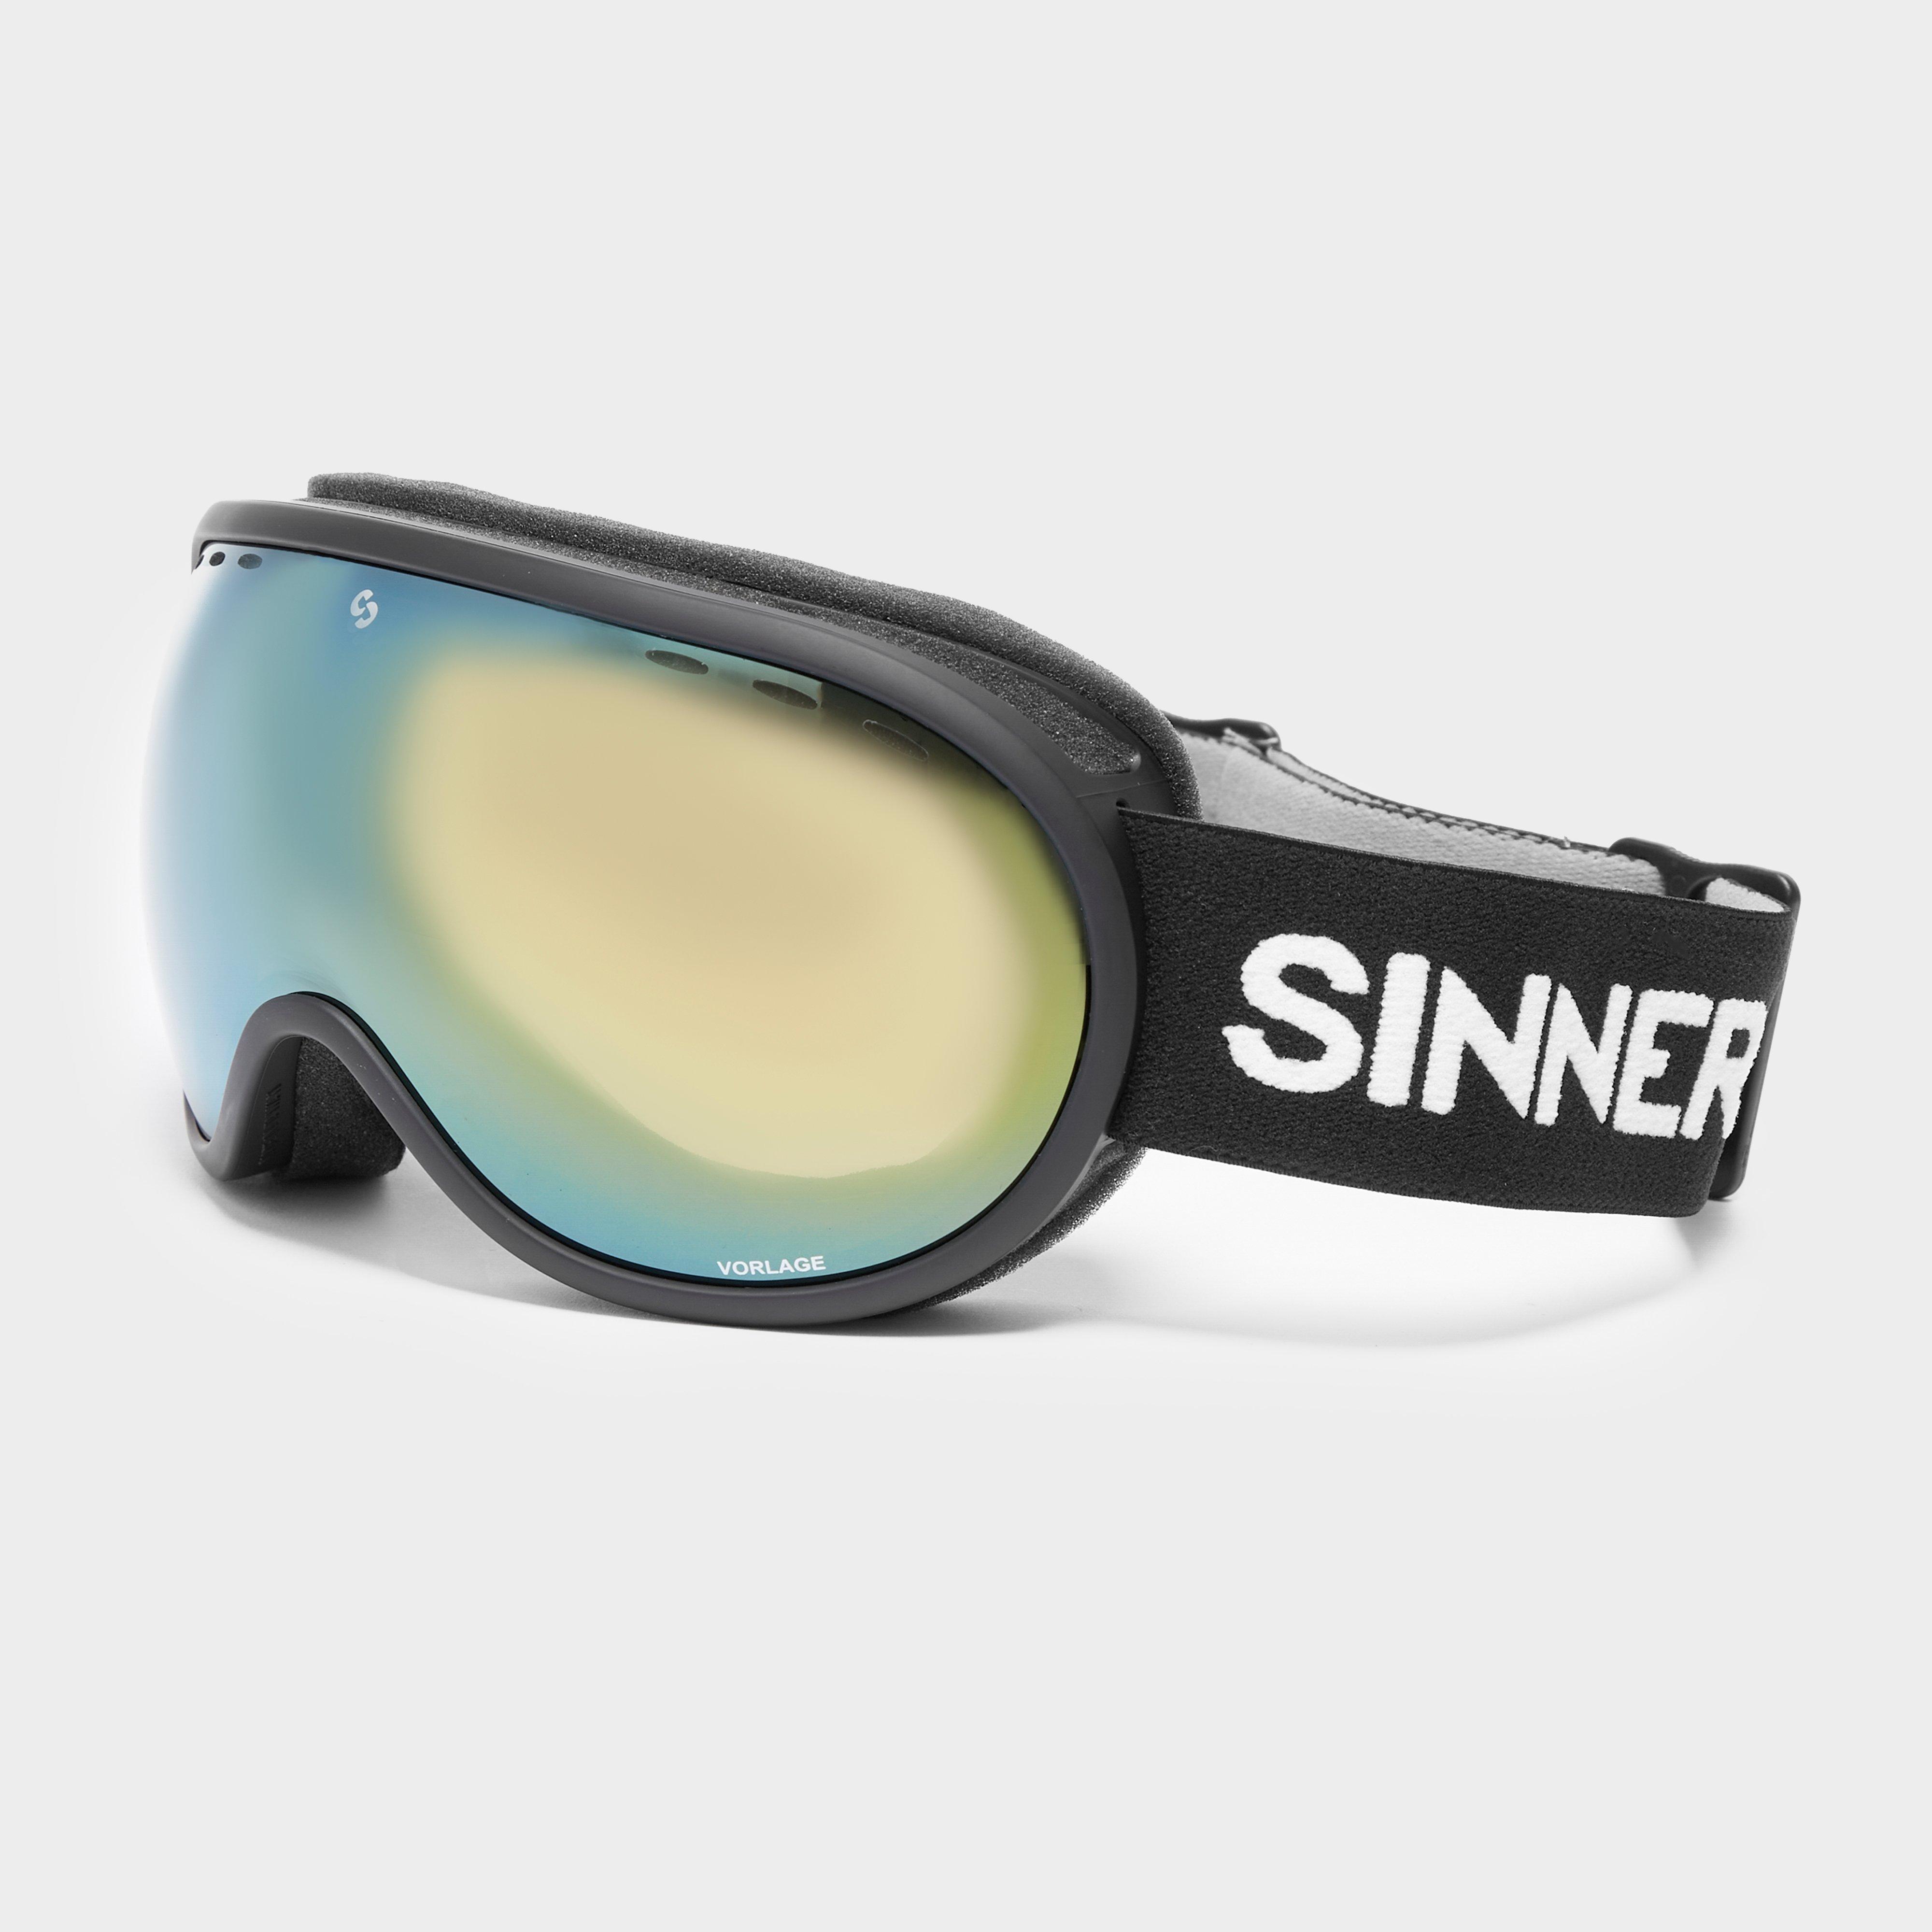 Sinner Vorlage Ski Goggles, Black/Orange